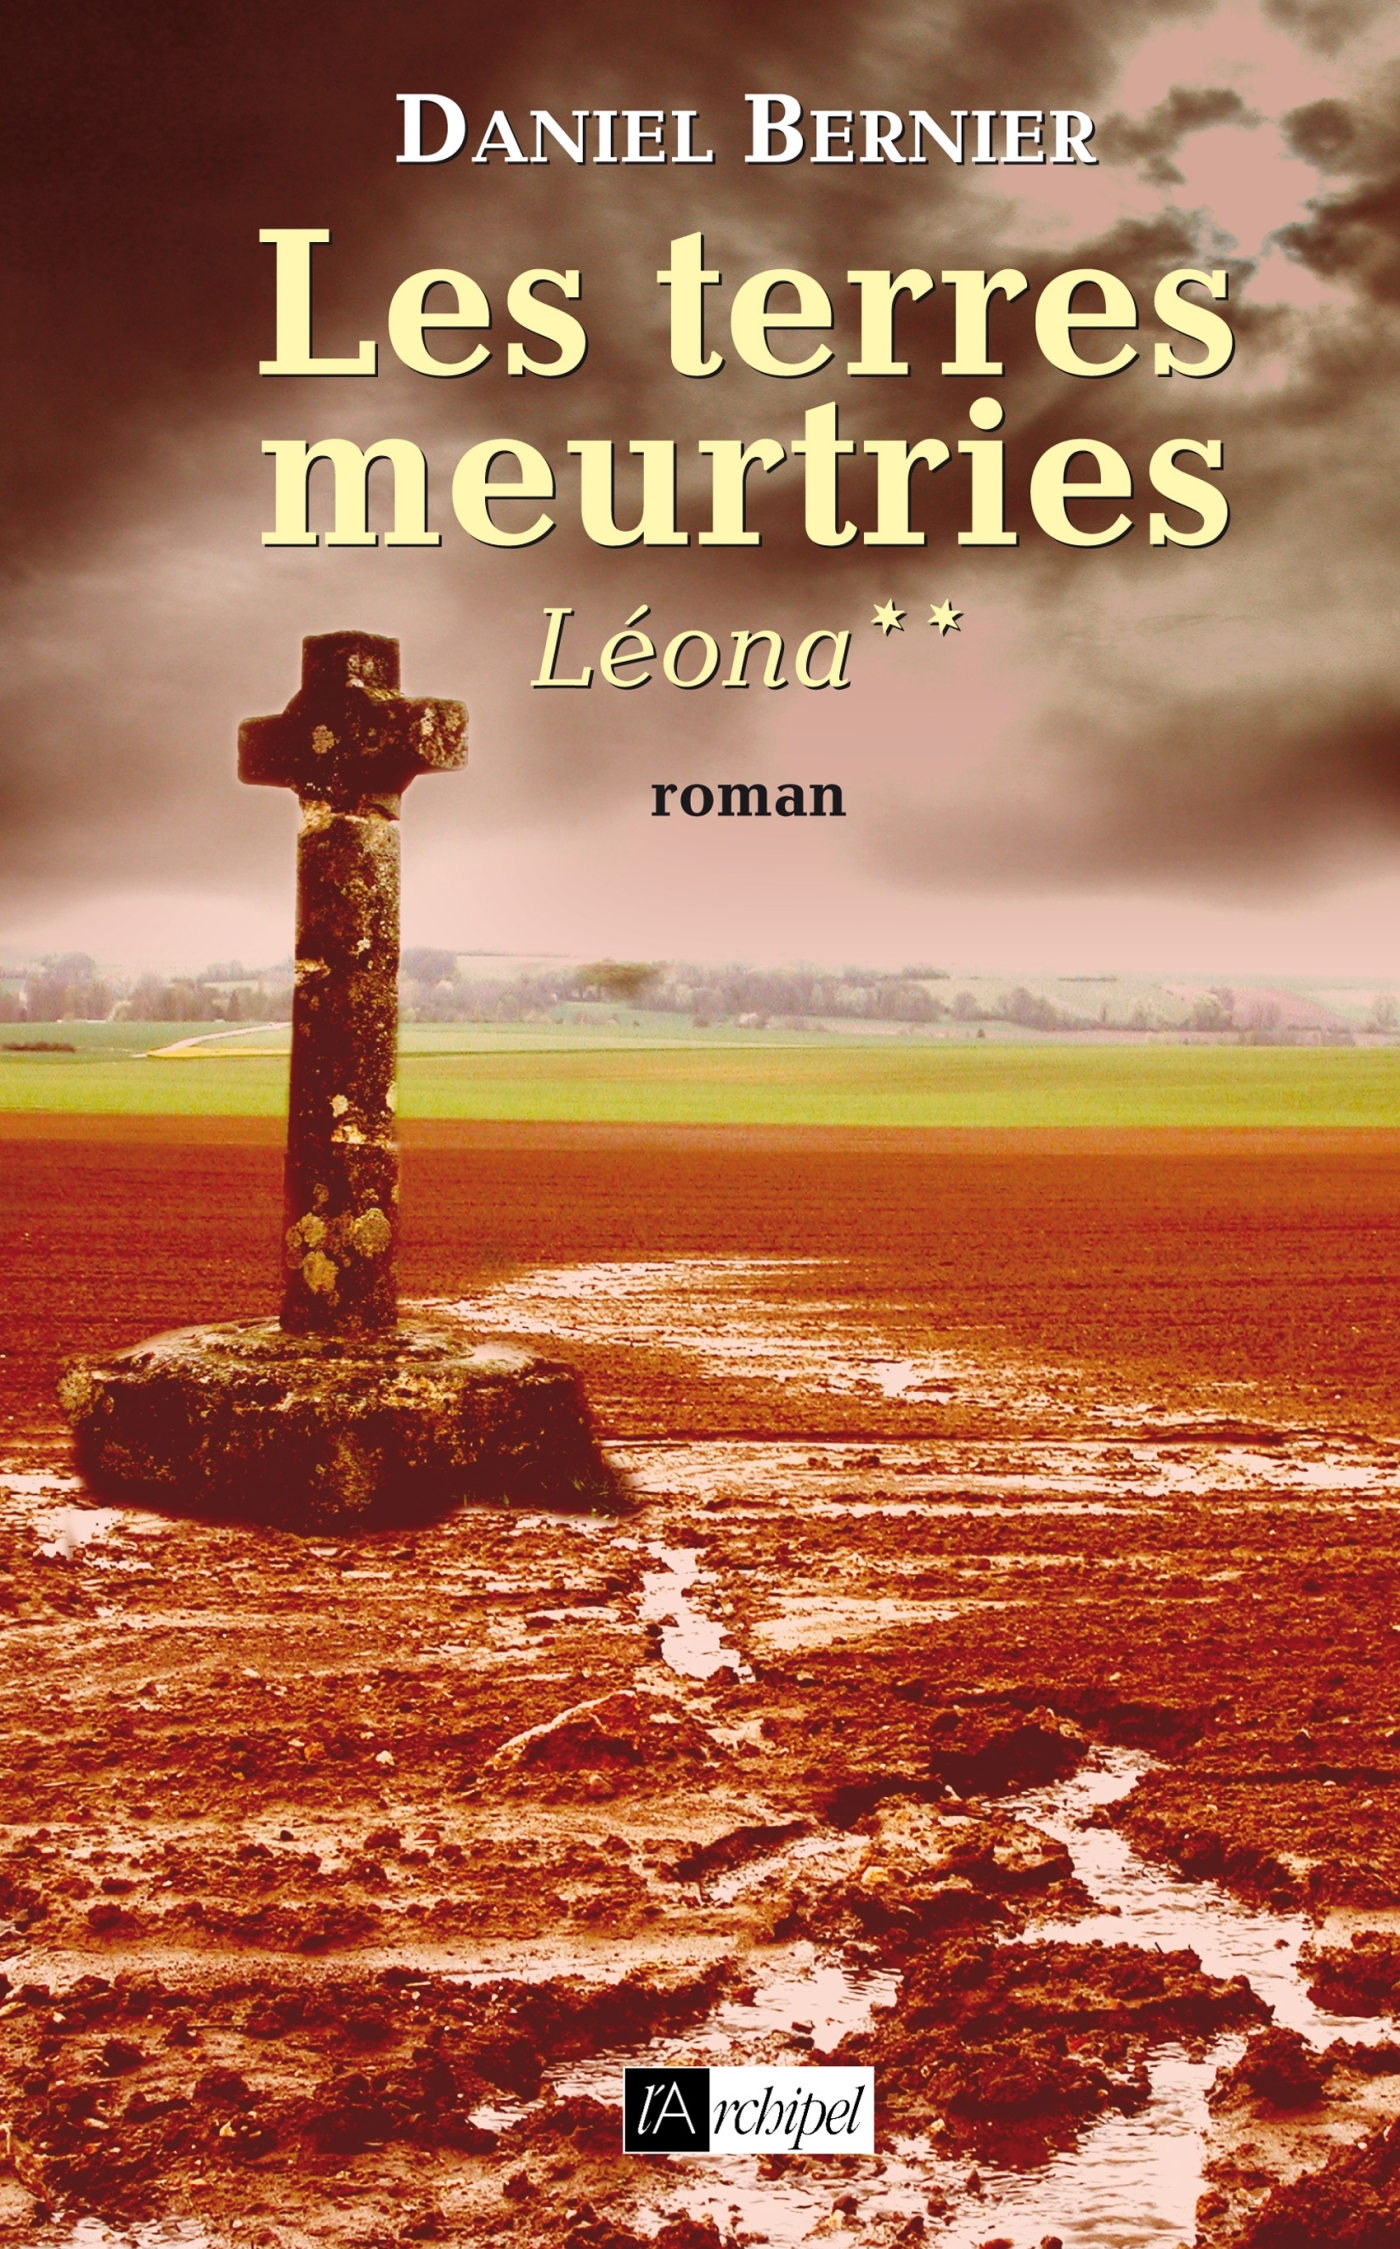 LES TERRES MEURTRIES (LEONA**)